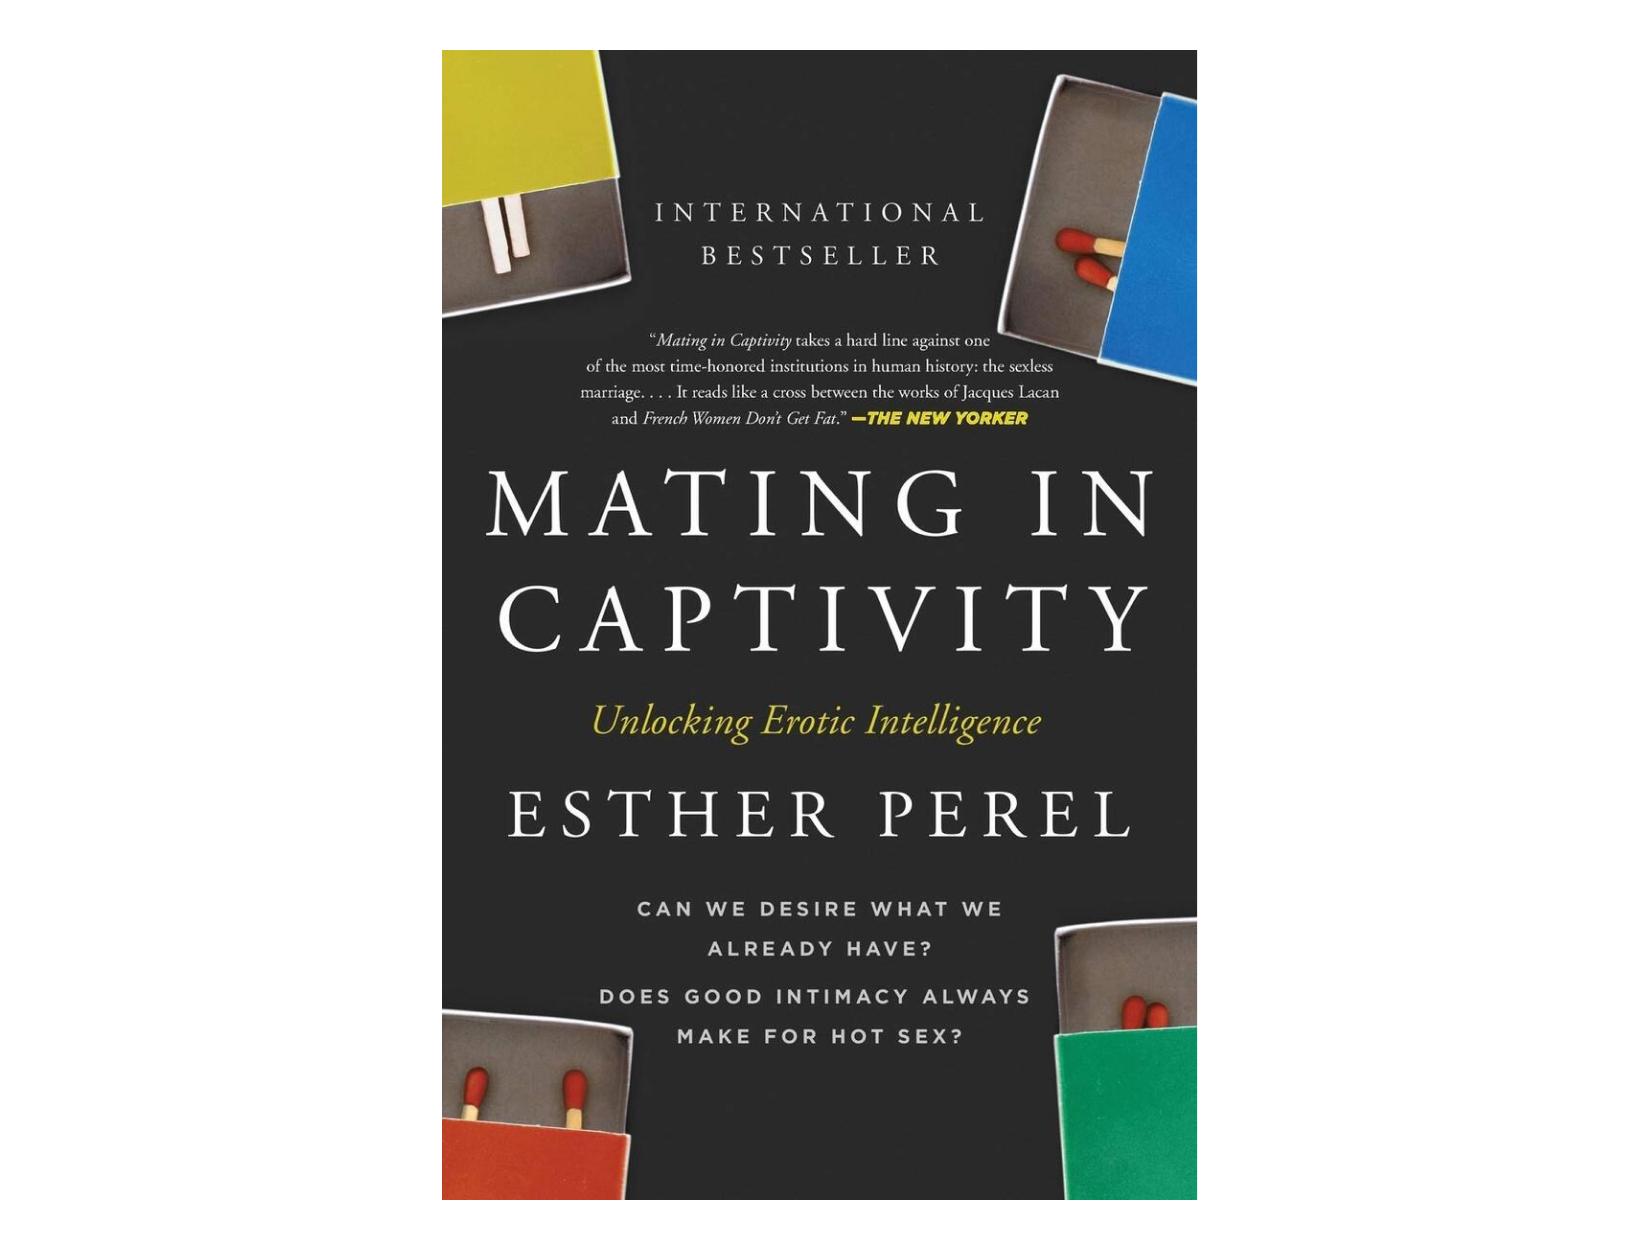 <em>Mating in Captivity</em> by Esther Perel